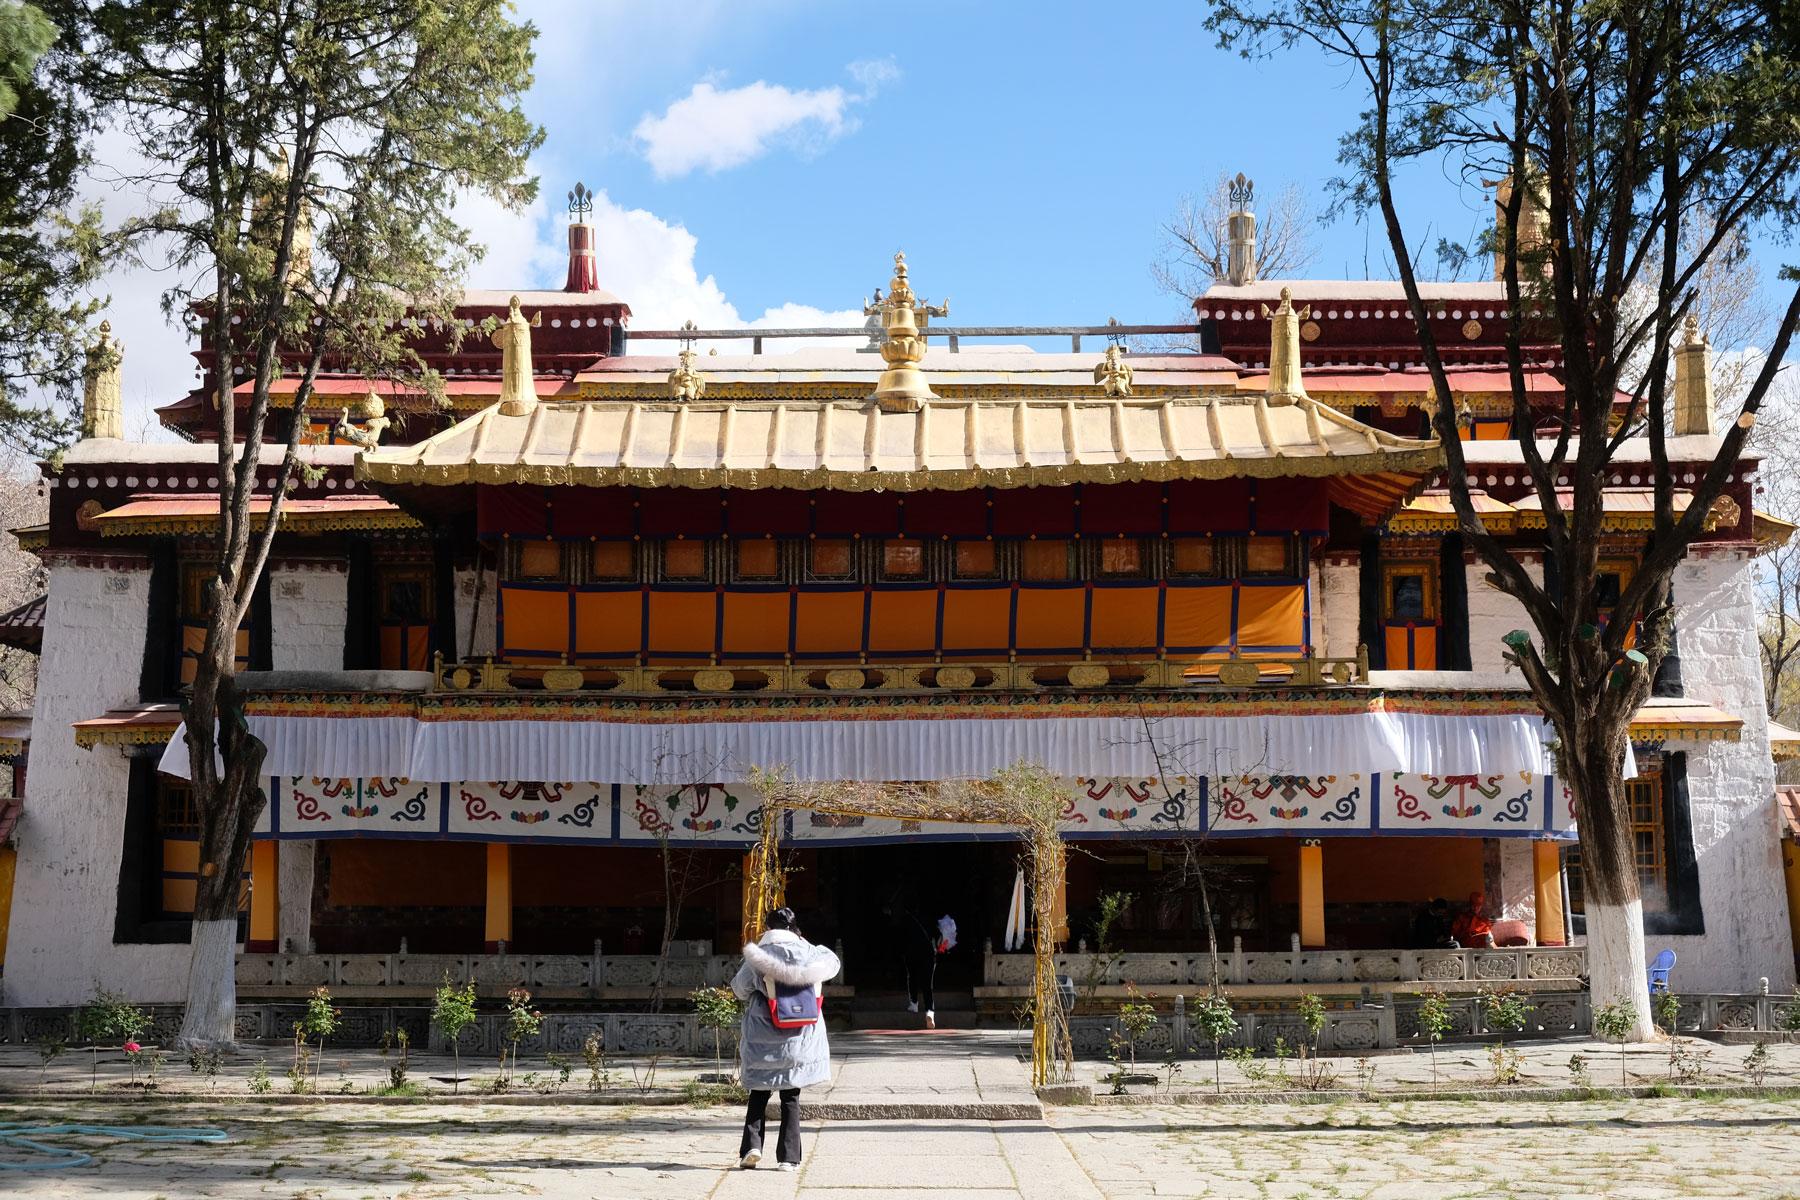 Der Nobulinka in Lhasa in Tibet.